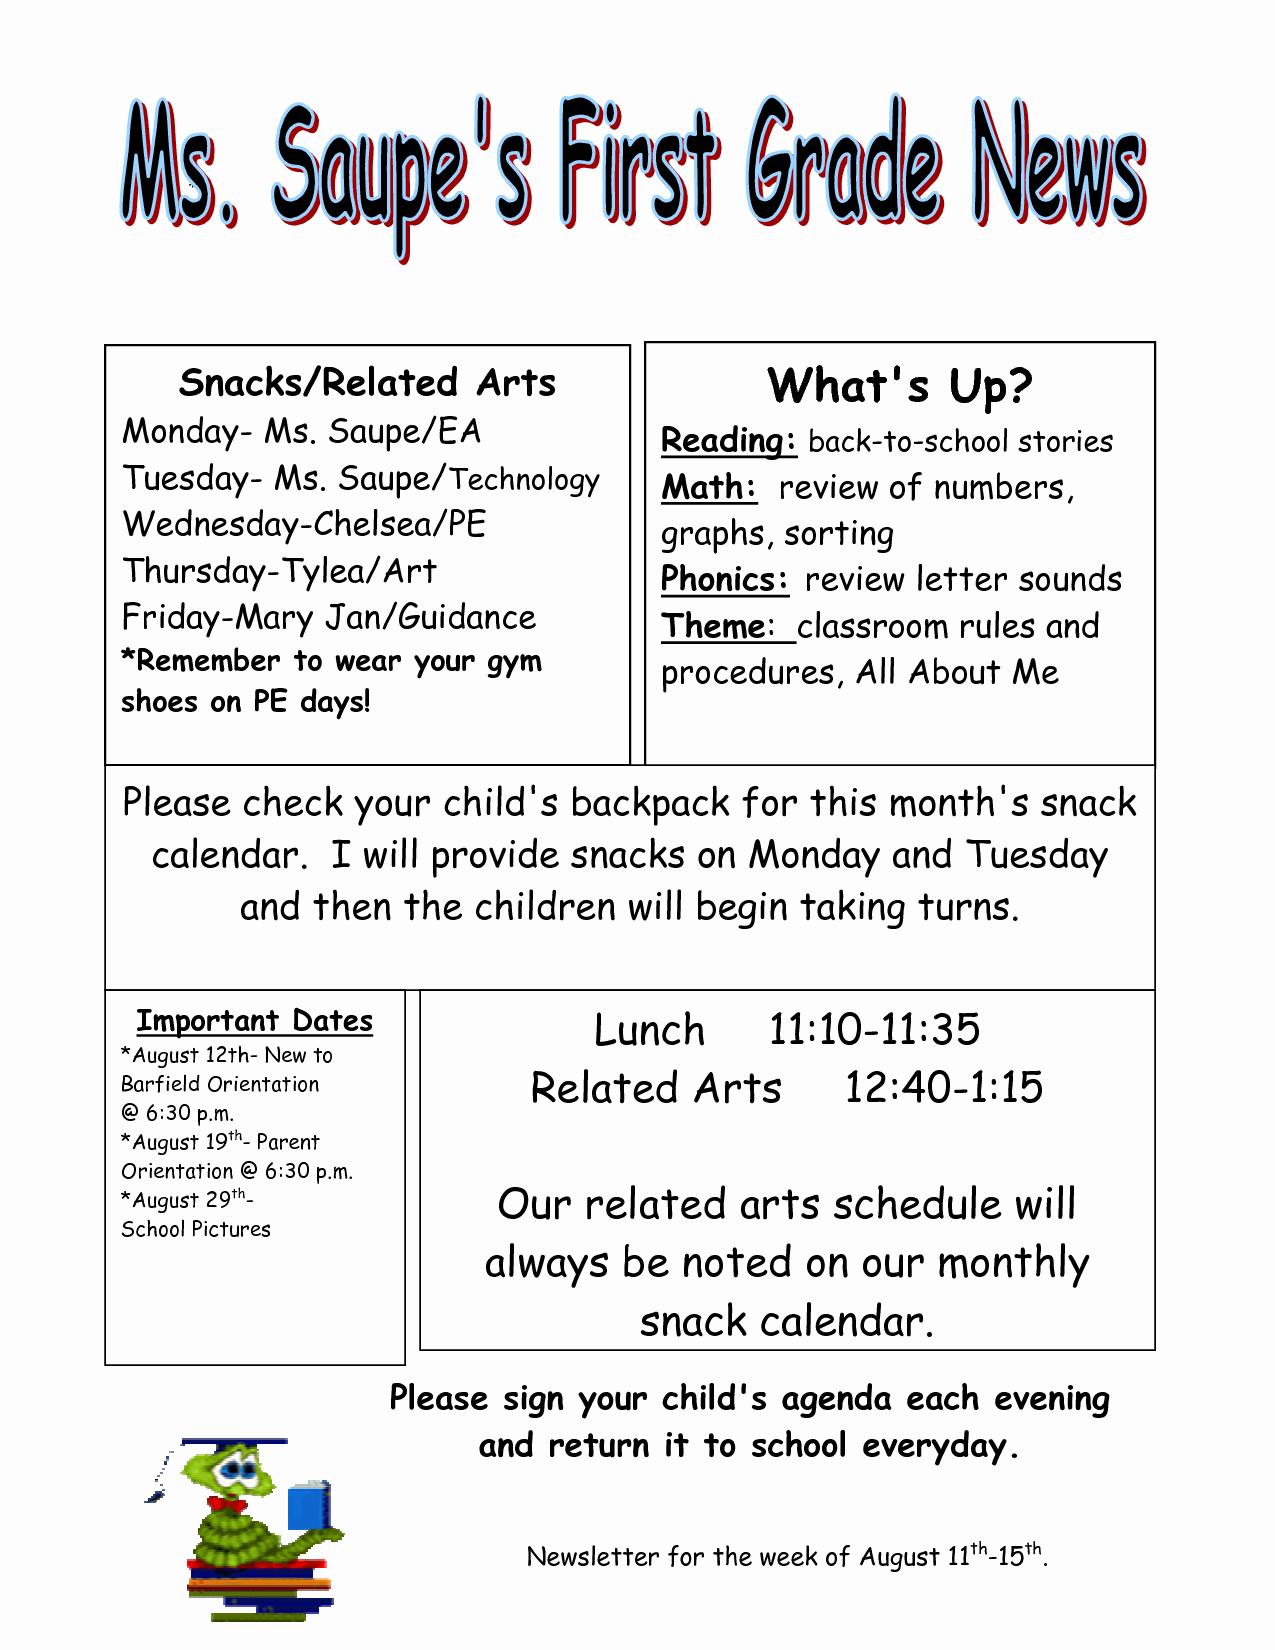 3rd Grade Newsletter Template Best Of Download Newsletter Templates for Teachers